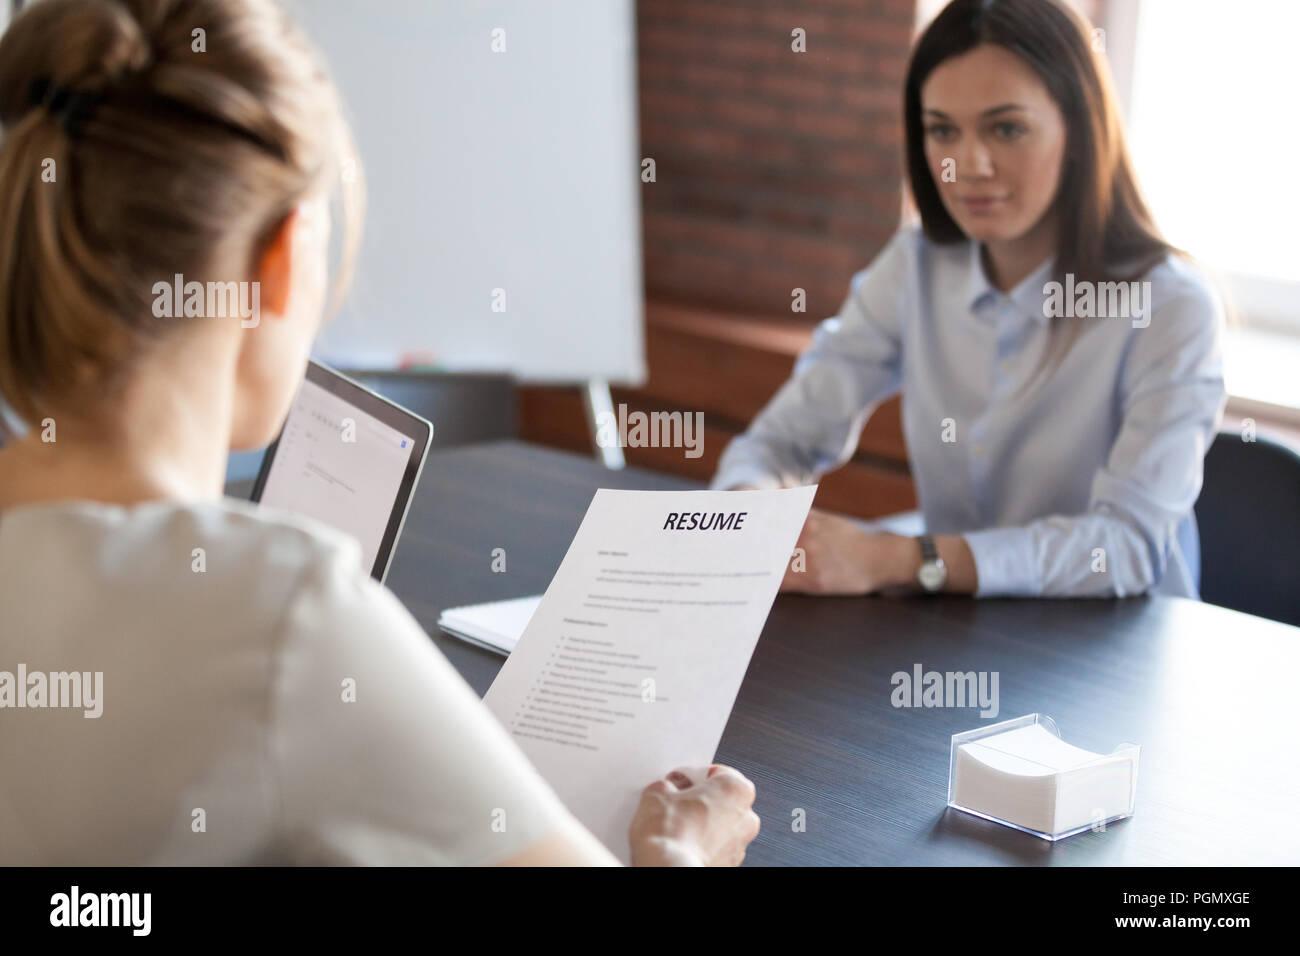 HR mangers hiring millennial female job candidate - Stock Image